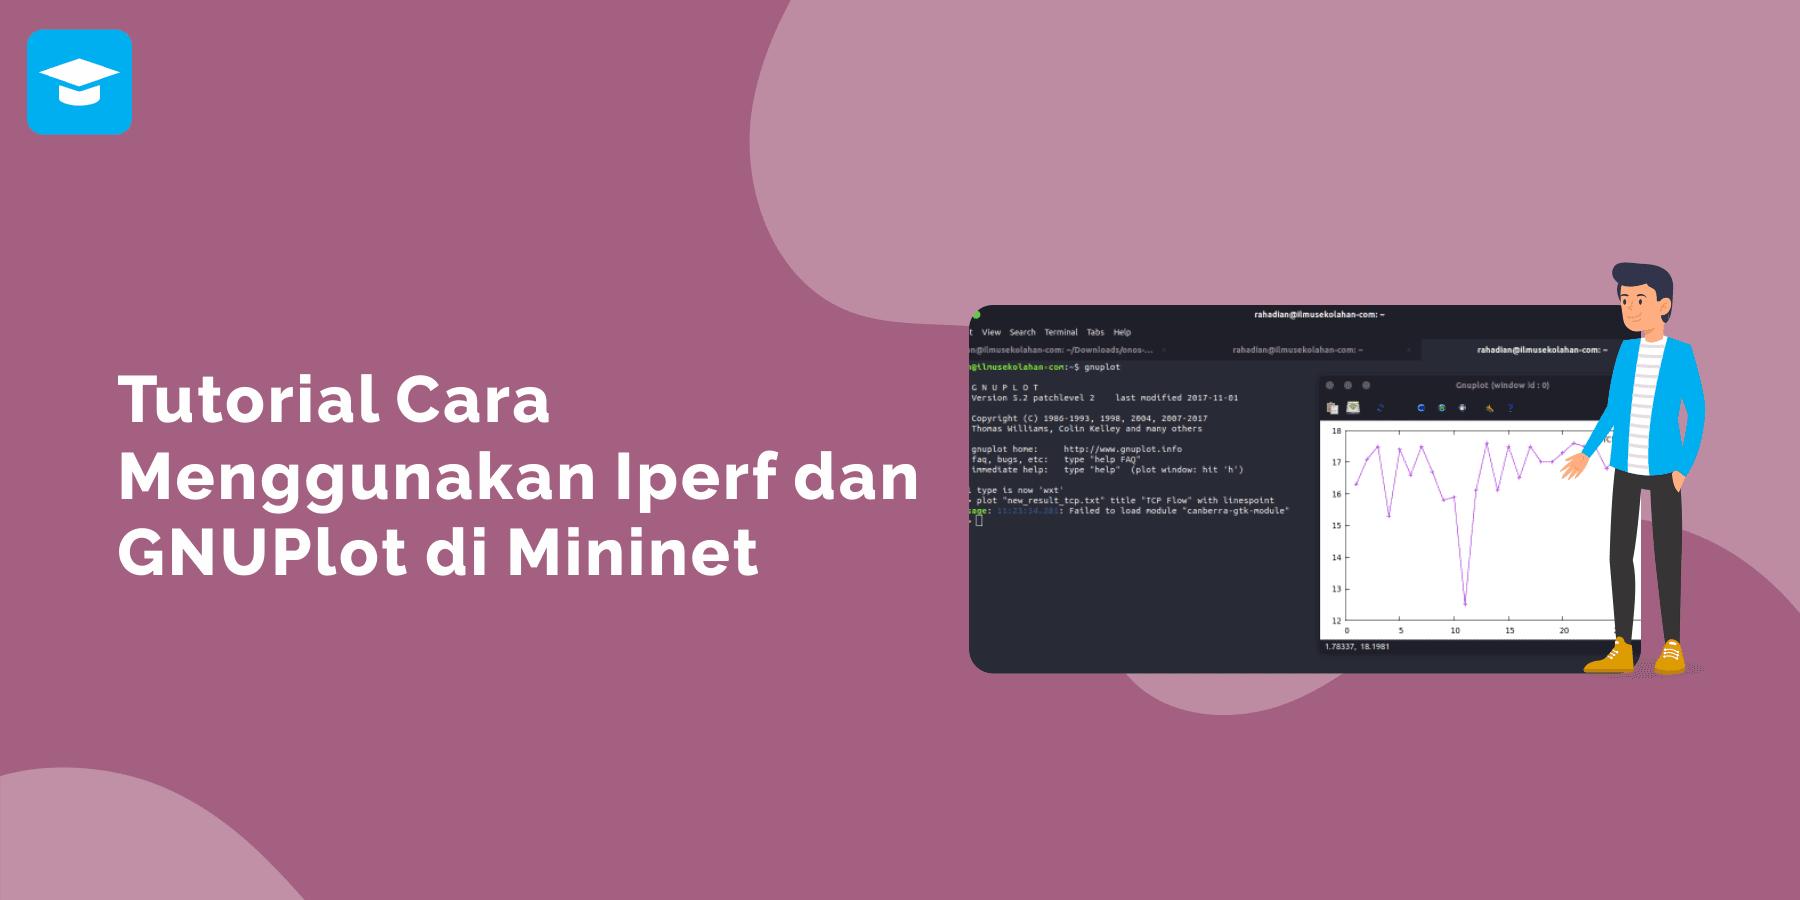 Cara menggunakan iperf dan GNUPLOT